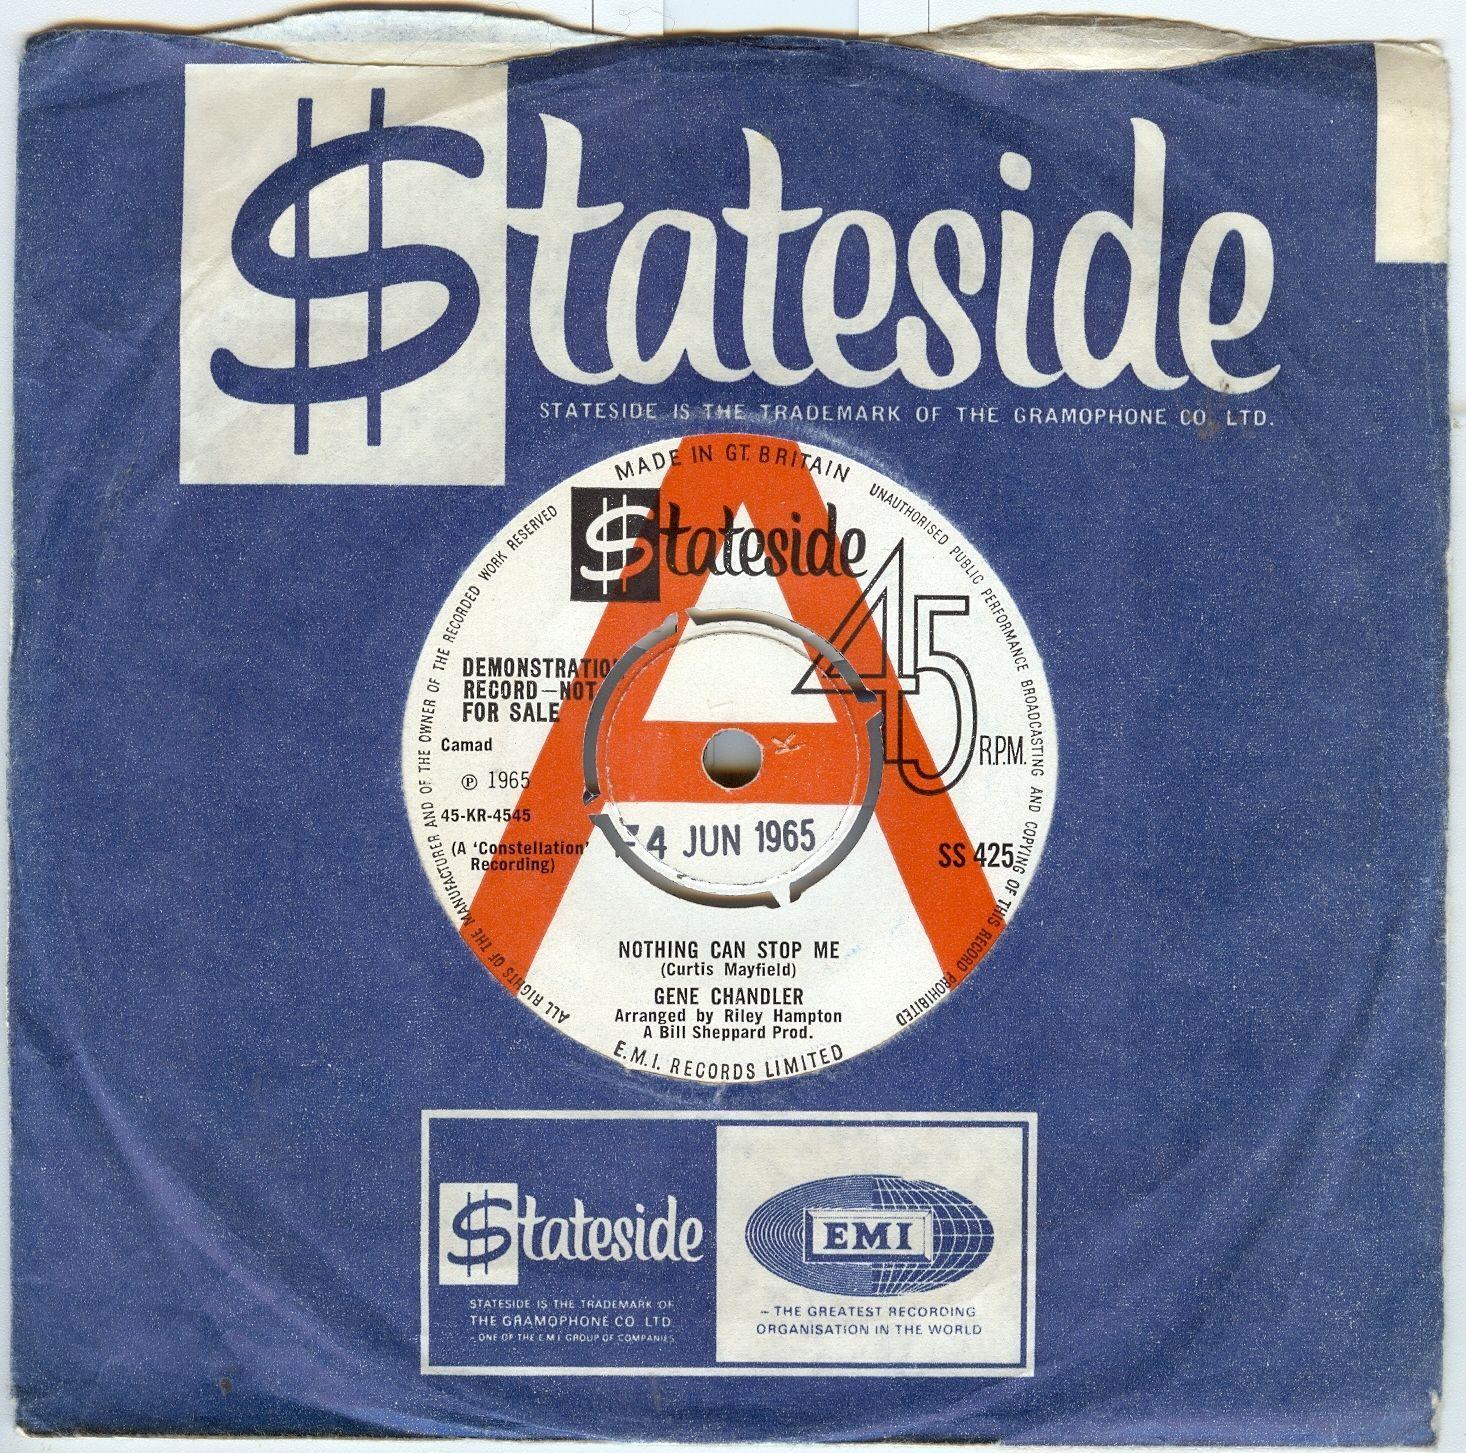 archived! GBP 259   Gene Chandlernothing Can Stop Medemosouldancerlisten To  #vinyl https://t.co/iJZkyKXtiH